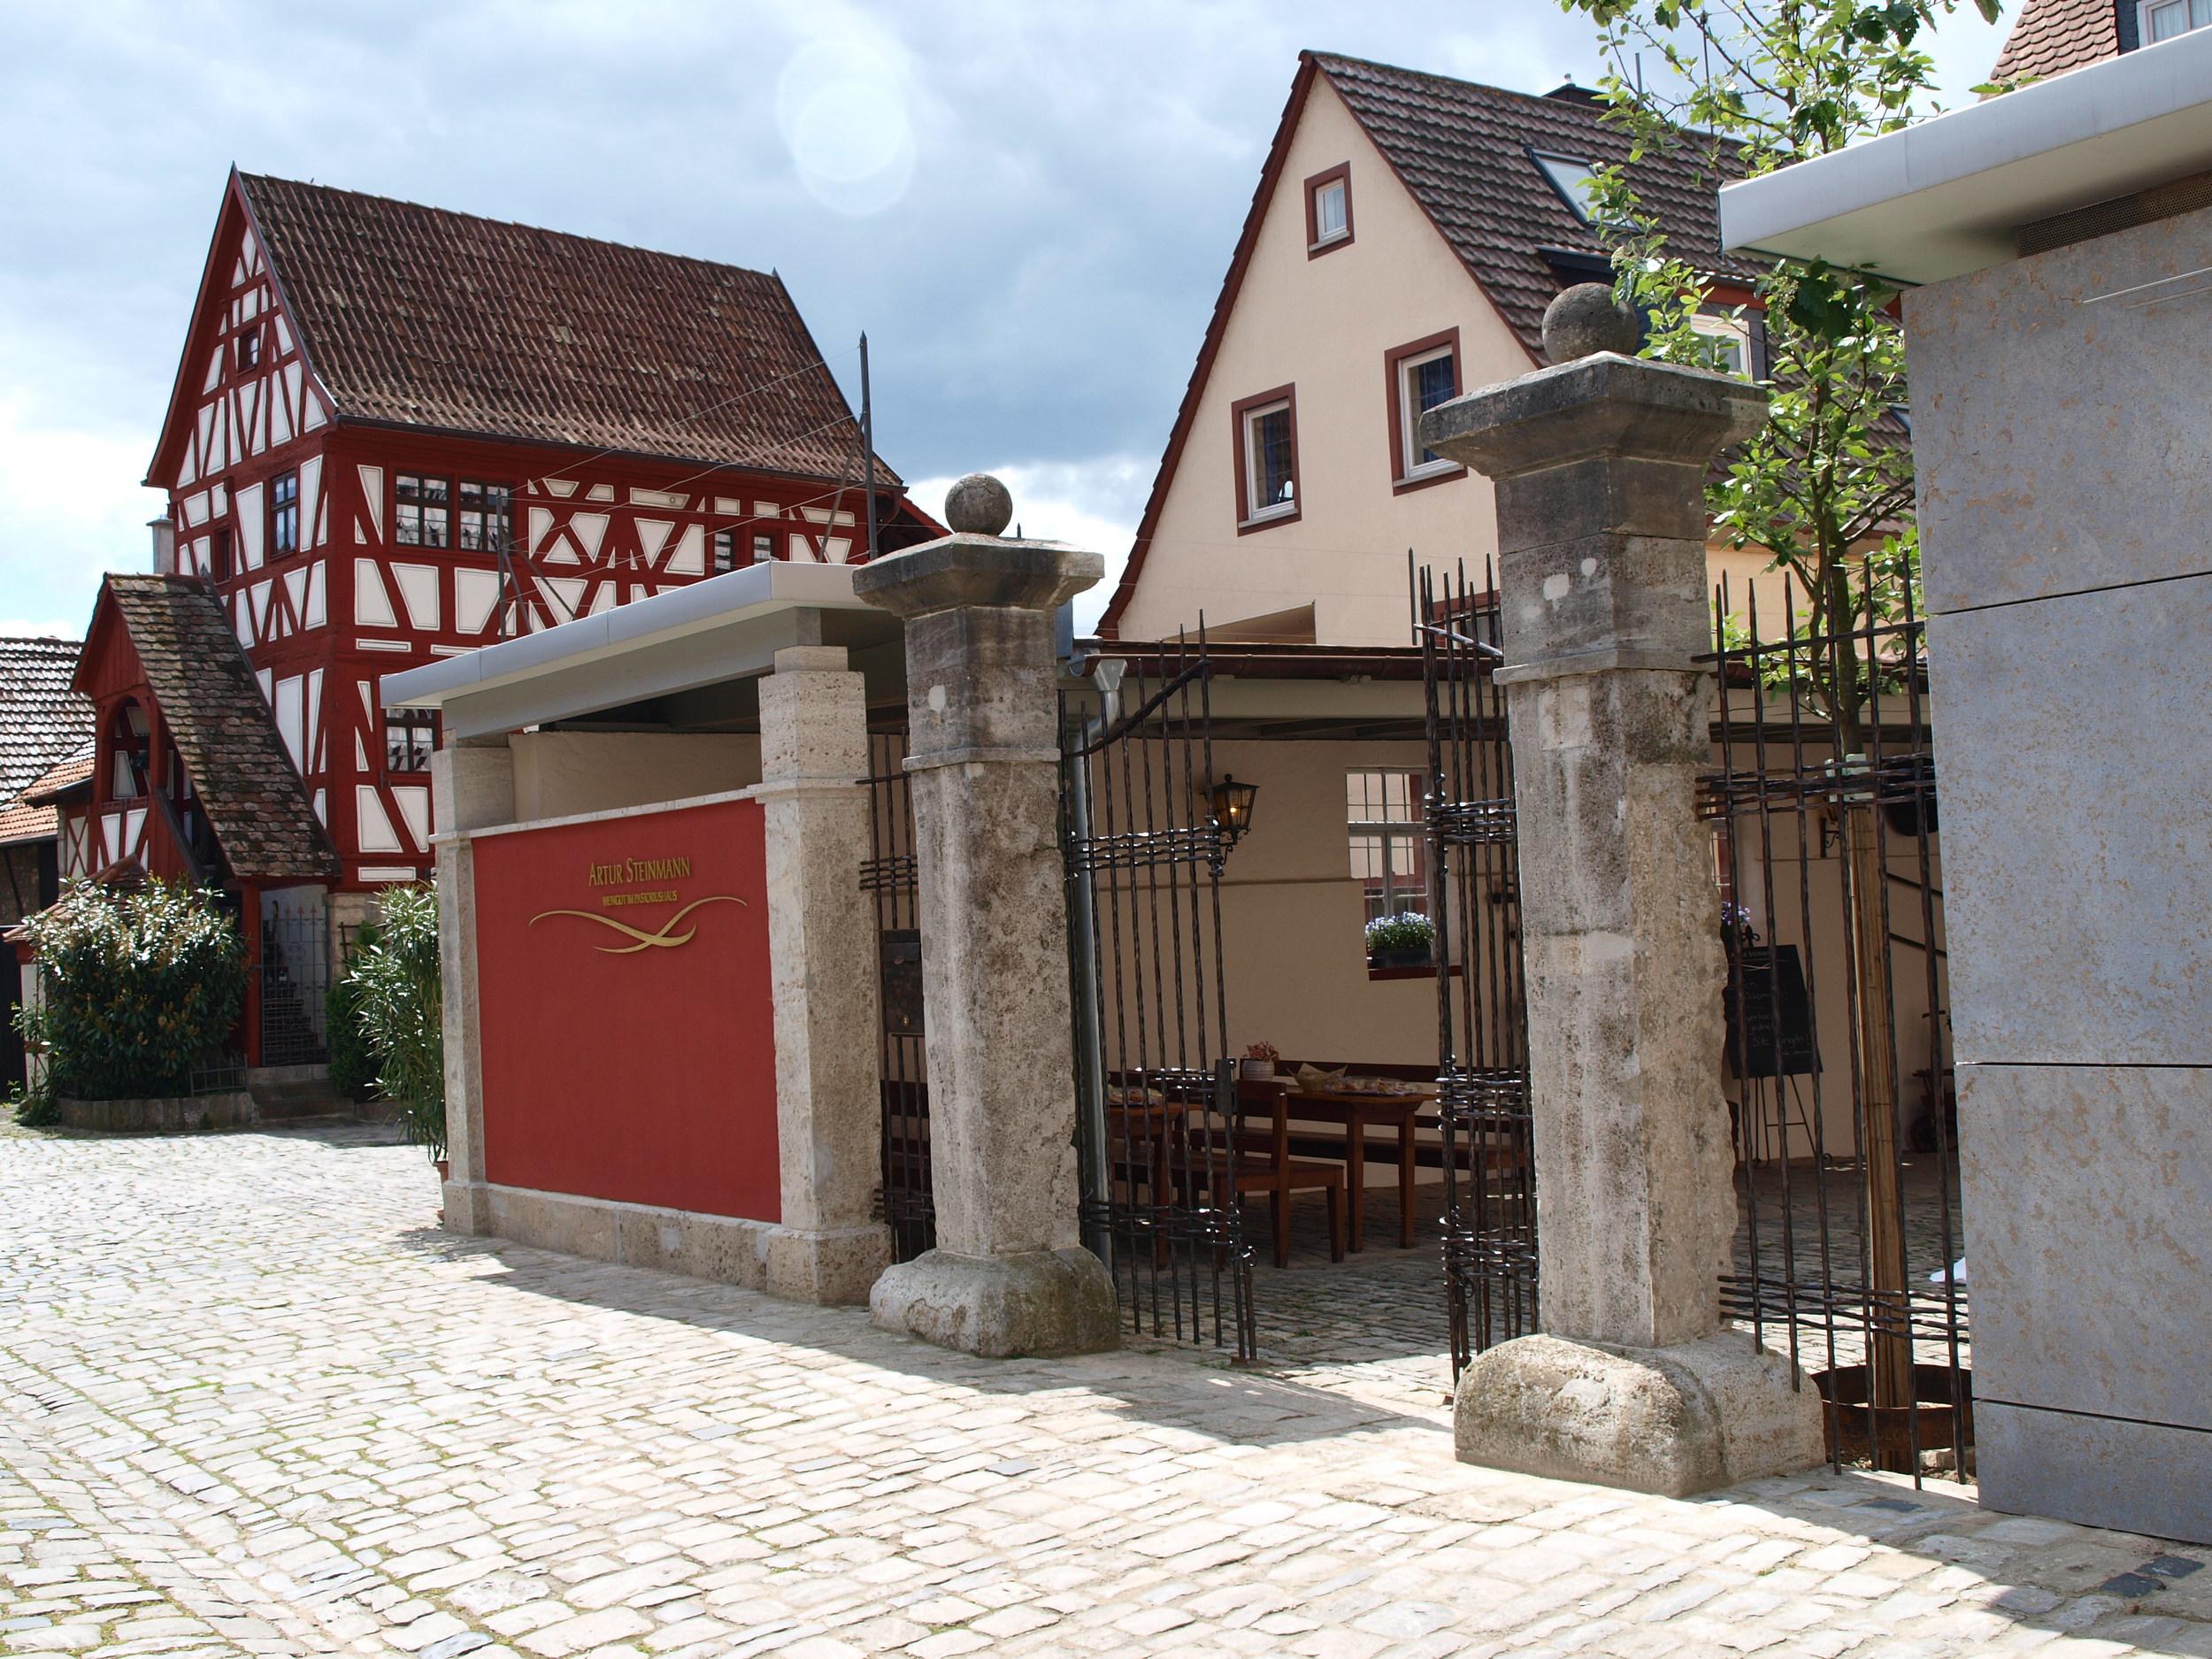 Sommerhausen-steinmann-Pastoriushaus memorial.jpg